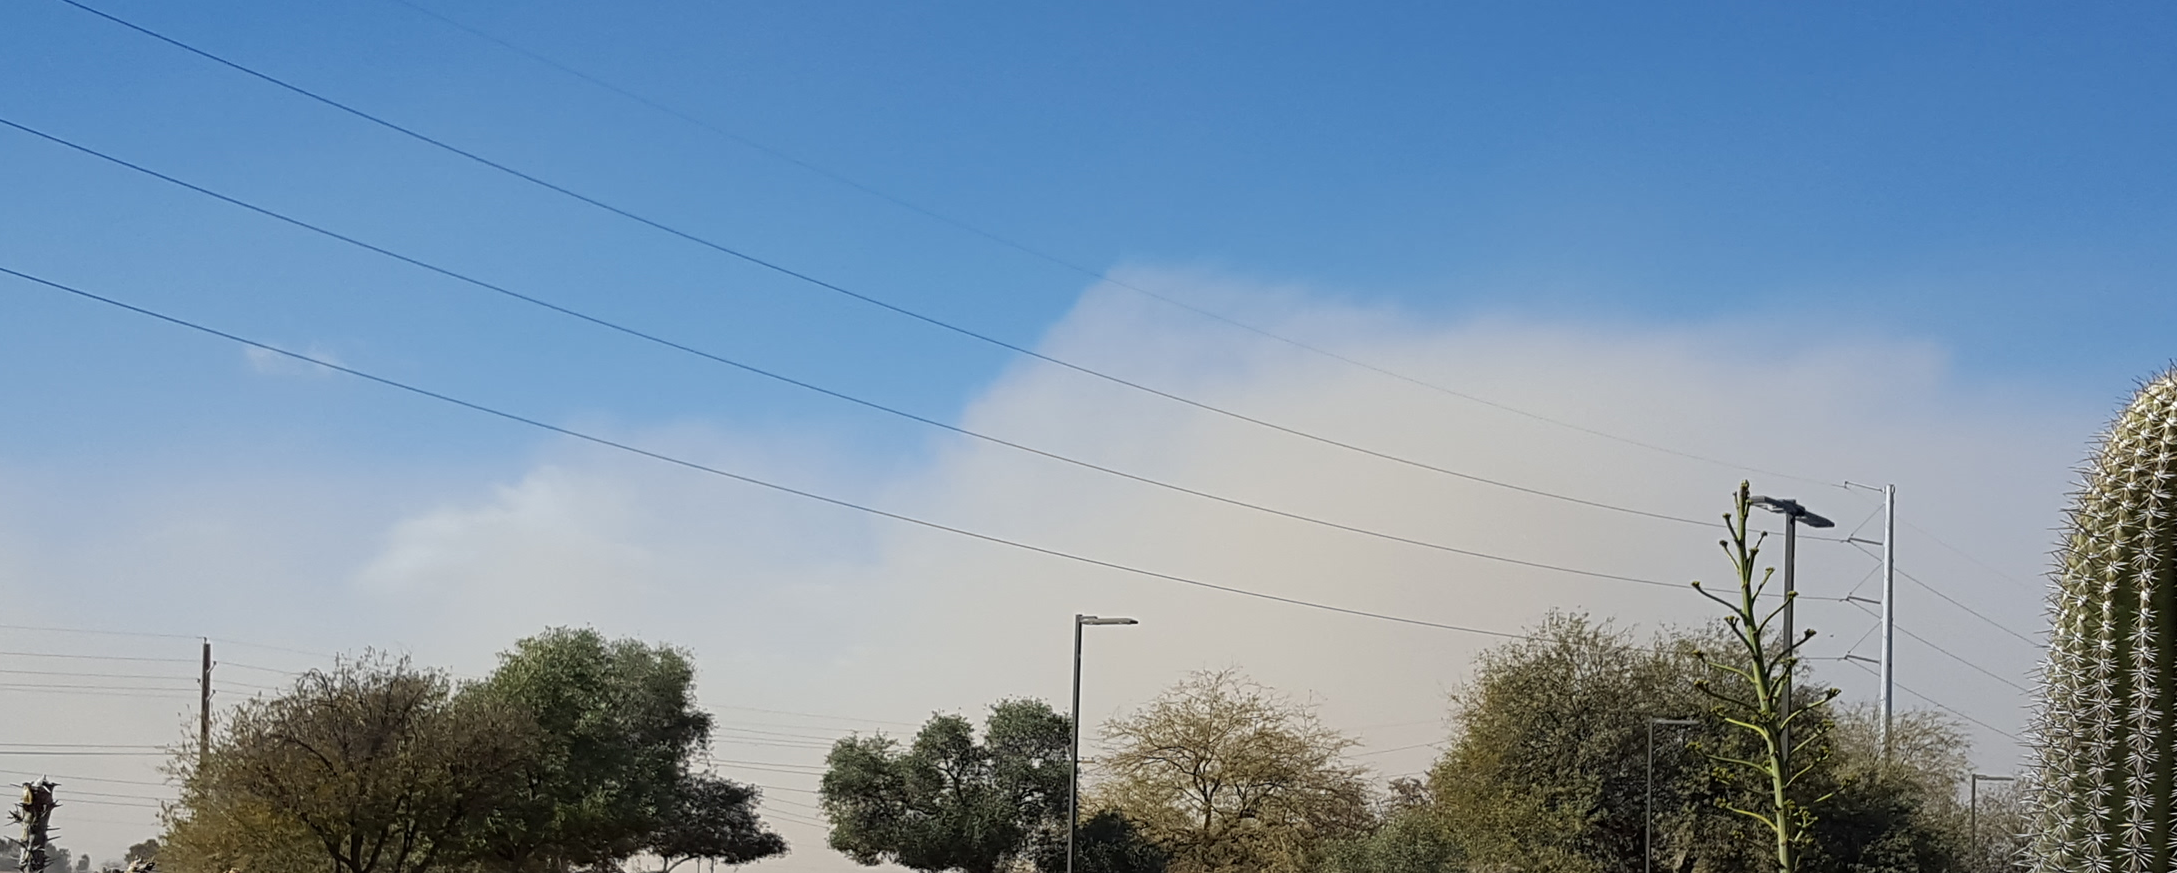 Seasonal dust storms